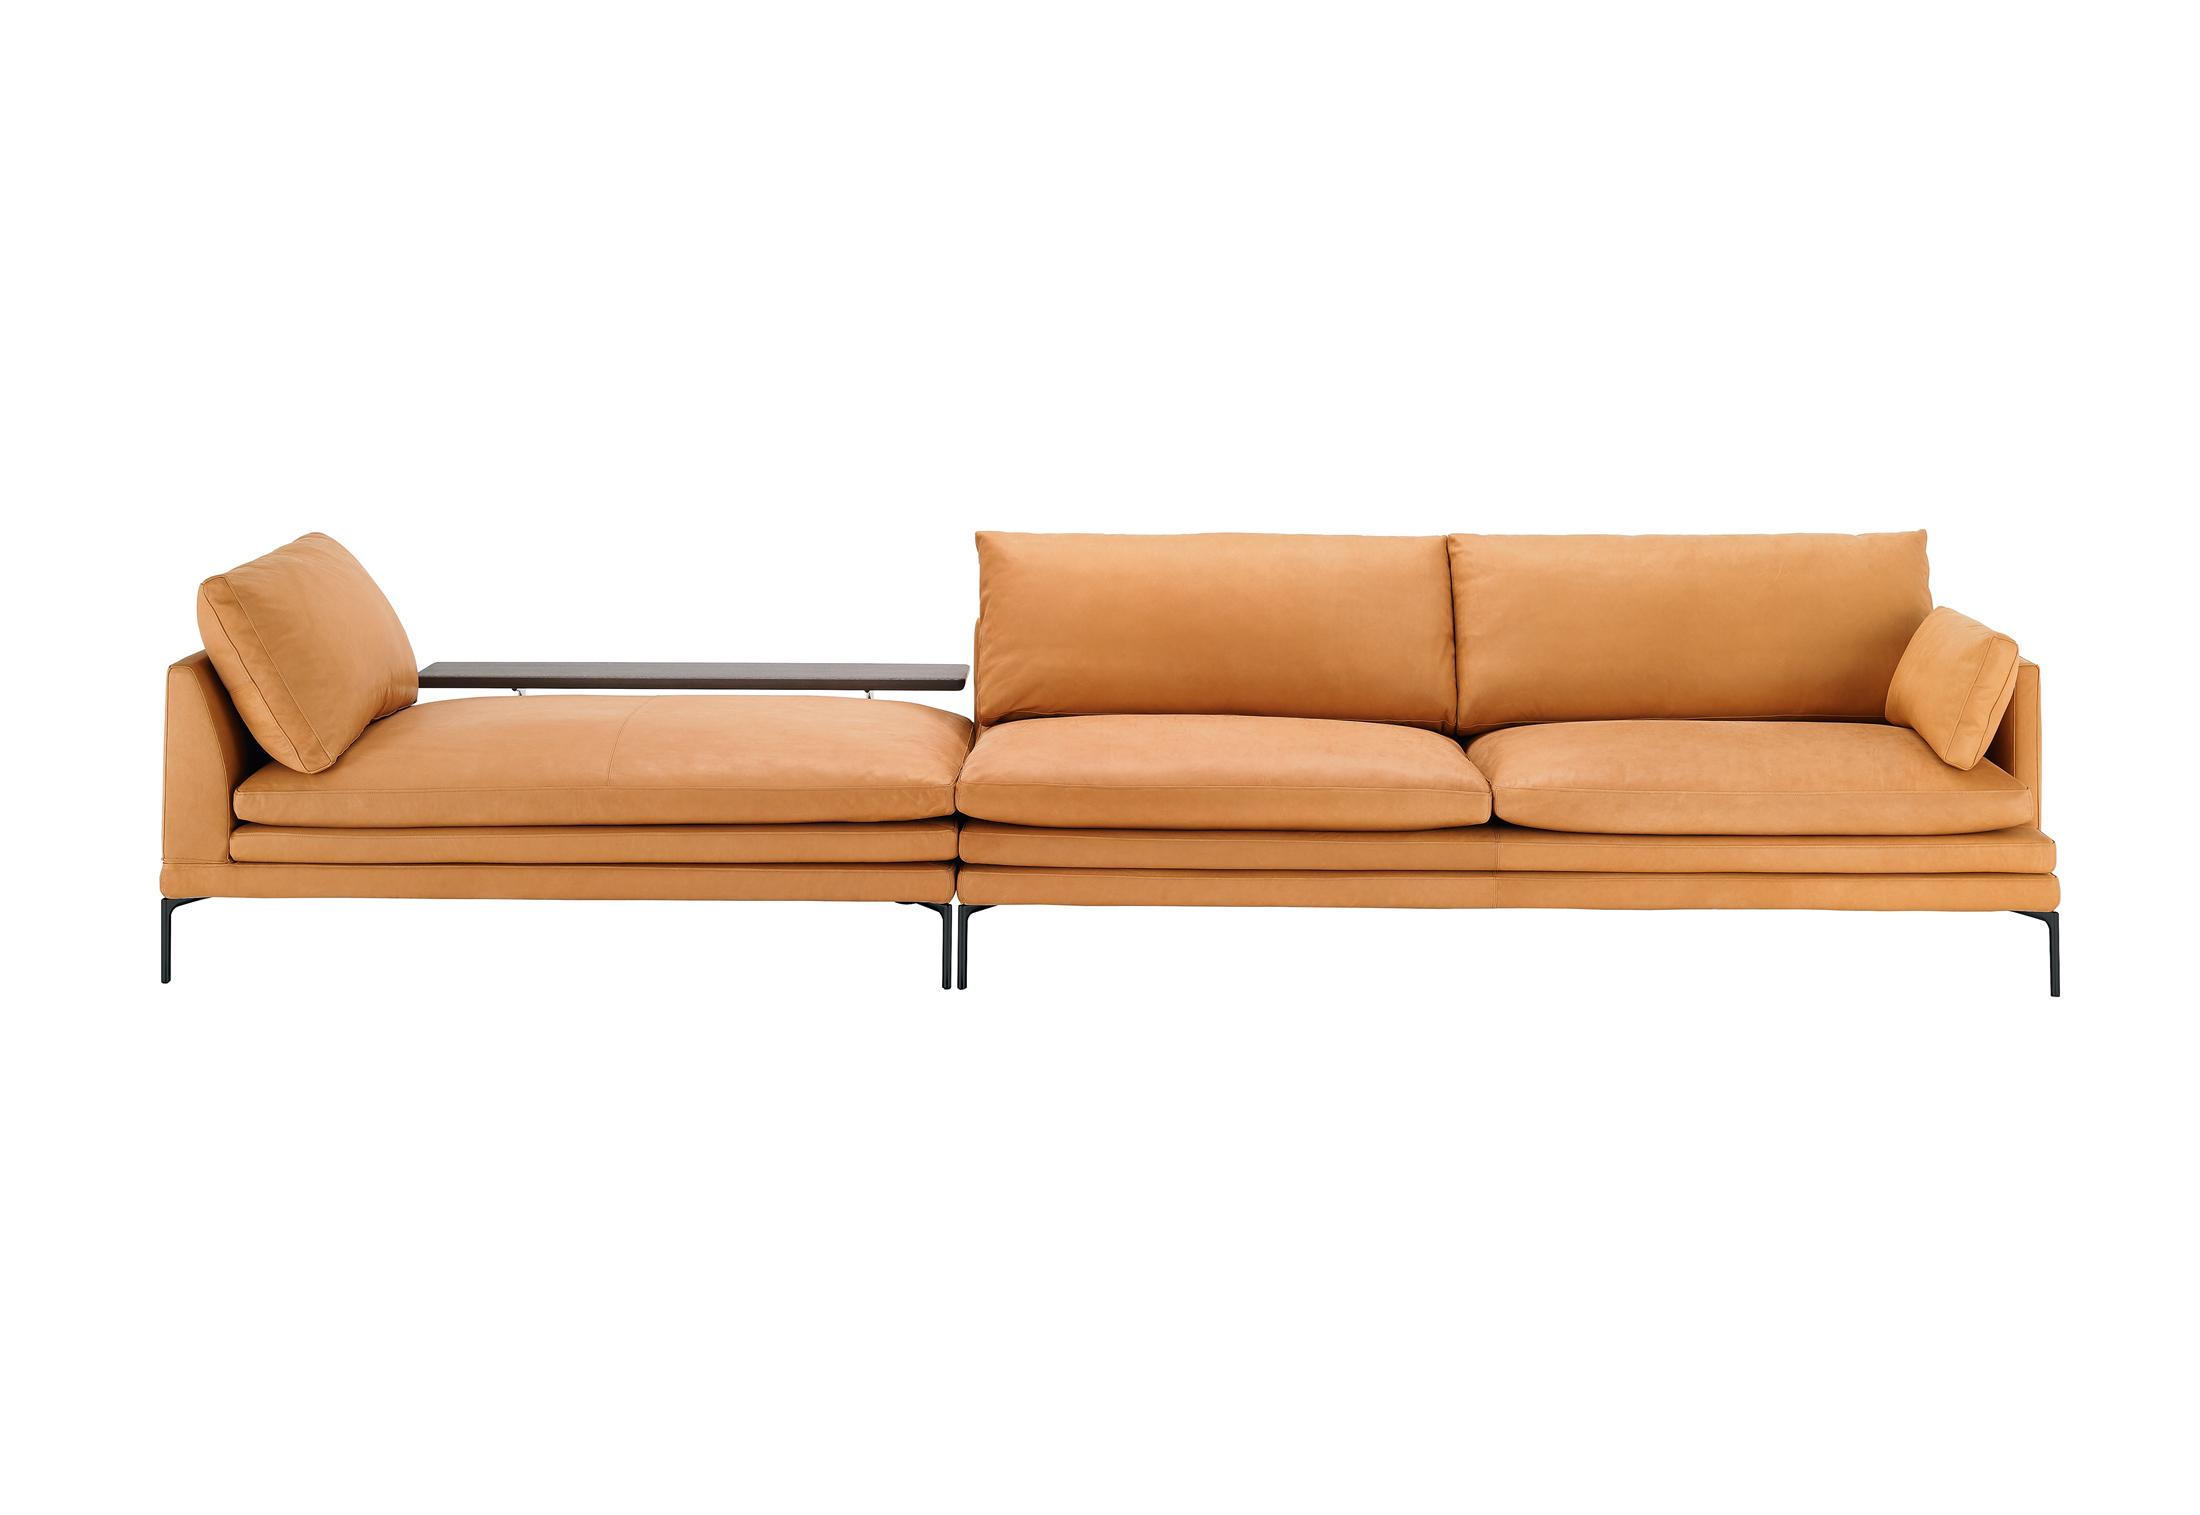 Zanotta Sofa Bed